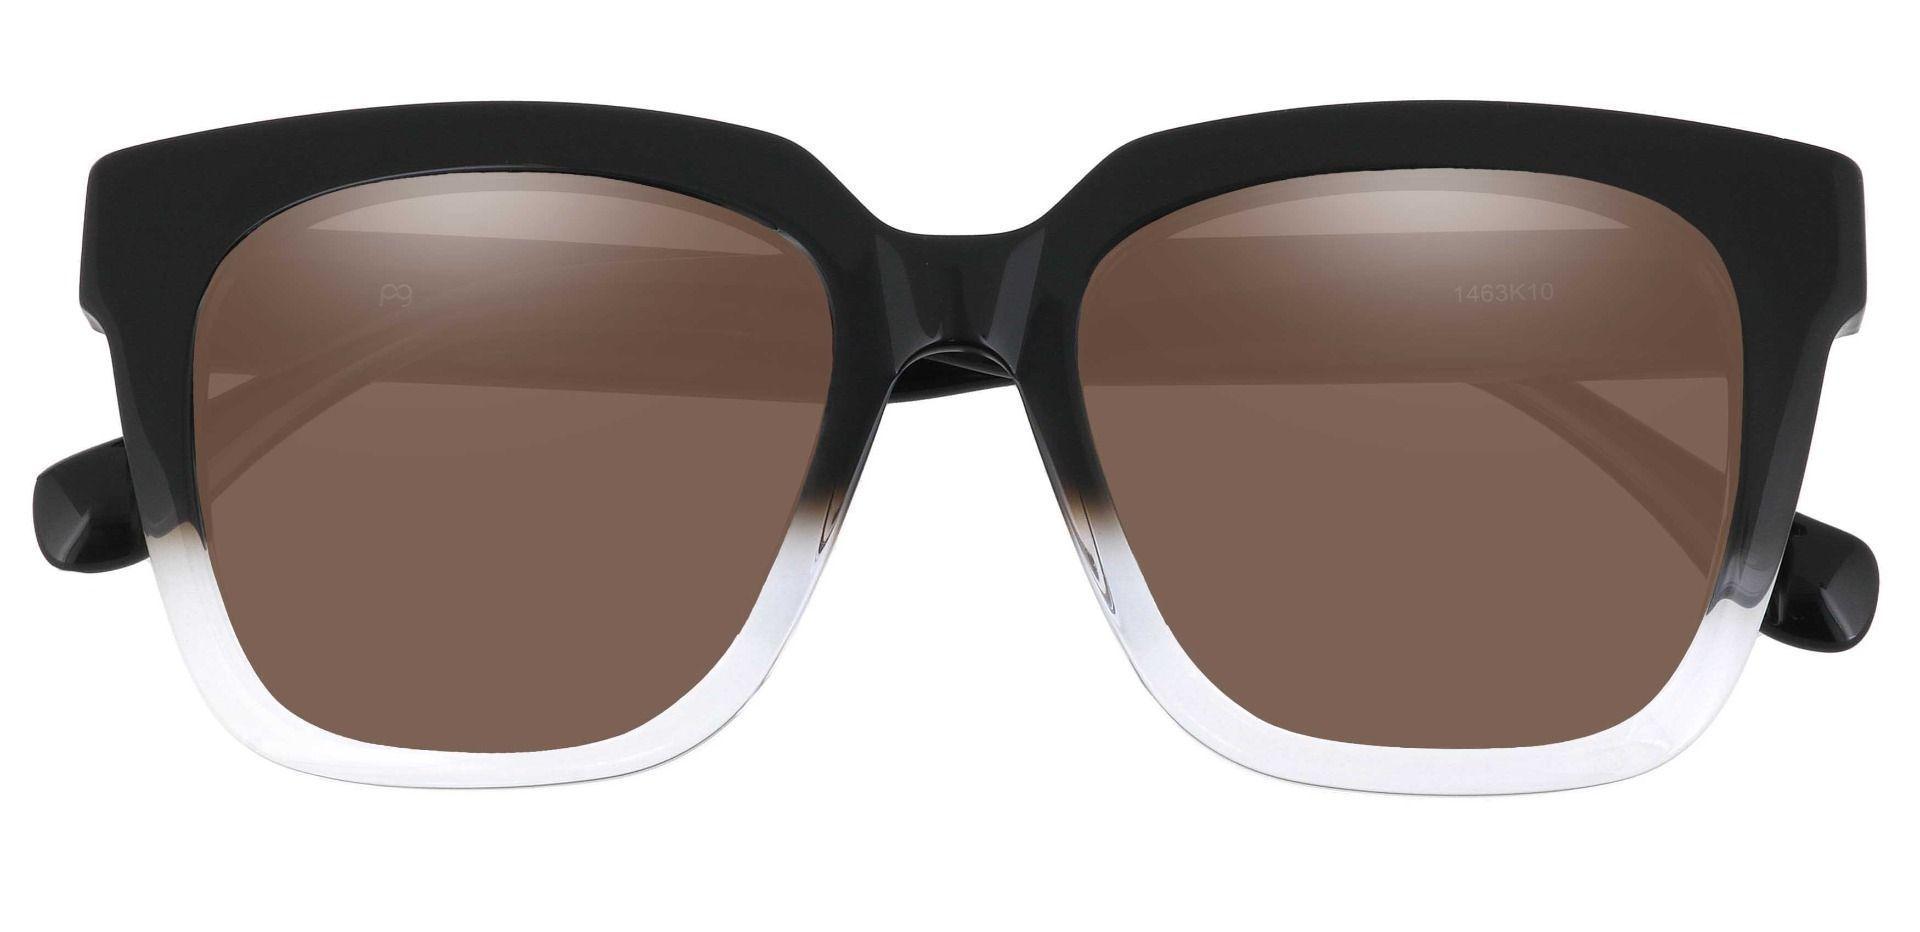 Lyric Square Prescription Sunglasses - Black Frame With Brown Lenses